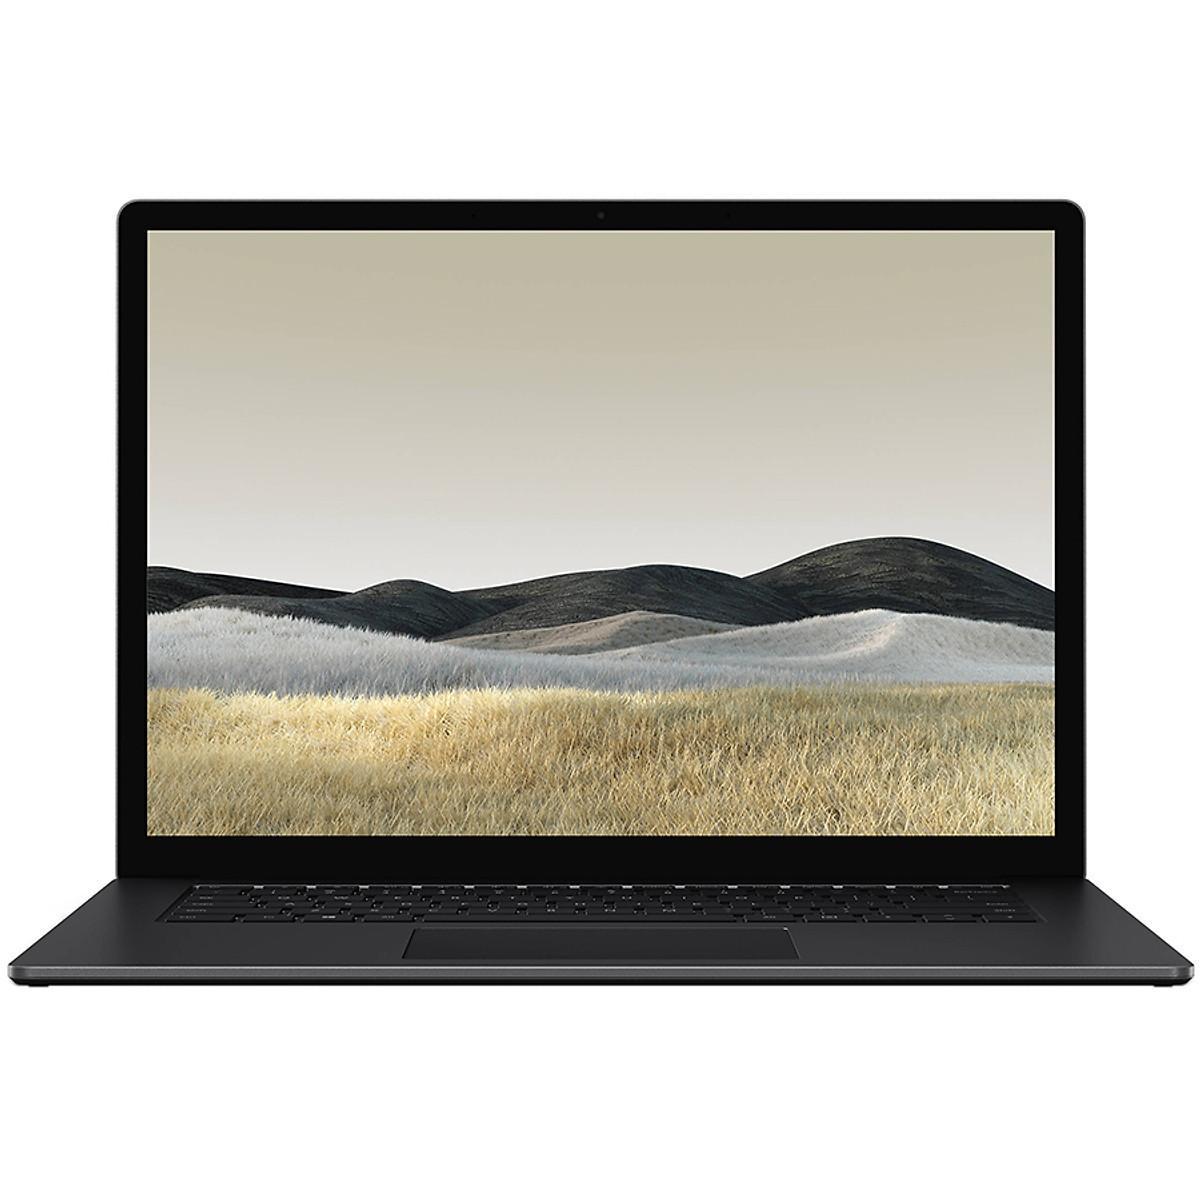 "So Sánh Giá Laptop Microsoft Surface 3 13"" (i5/8GB/128GB)"